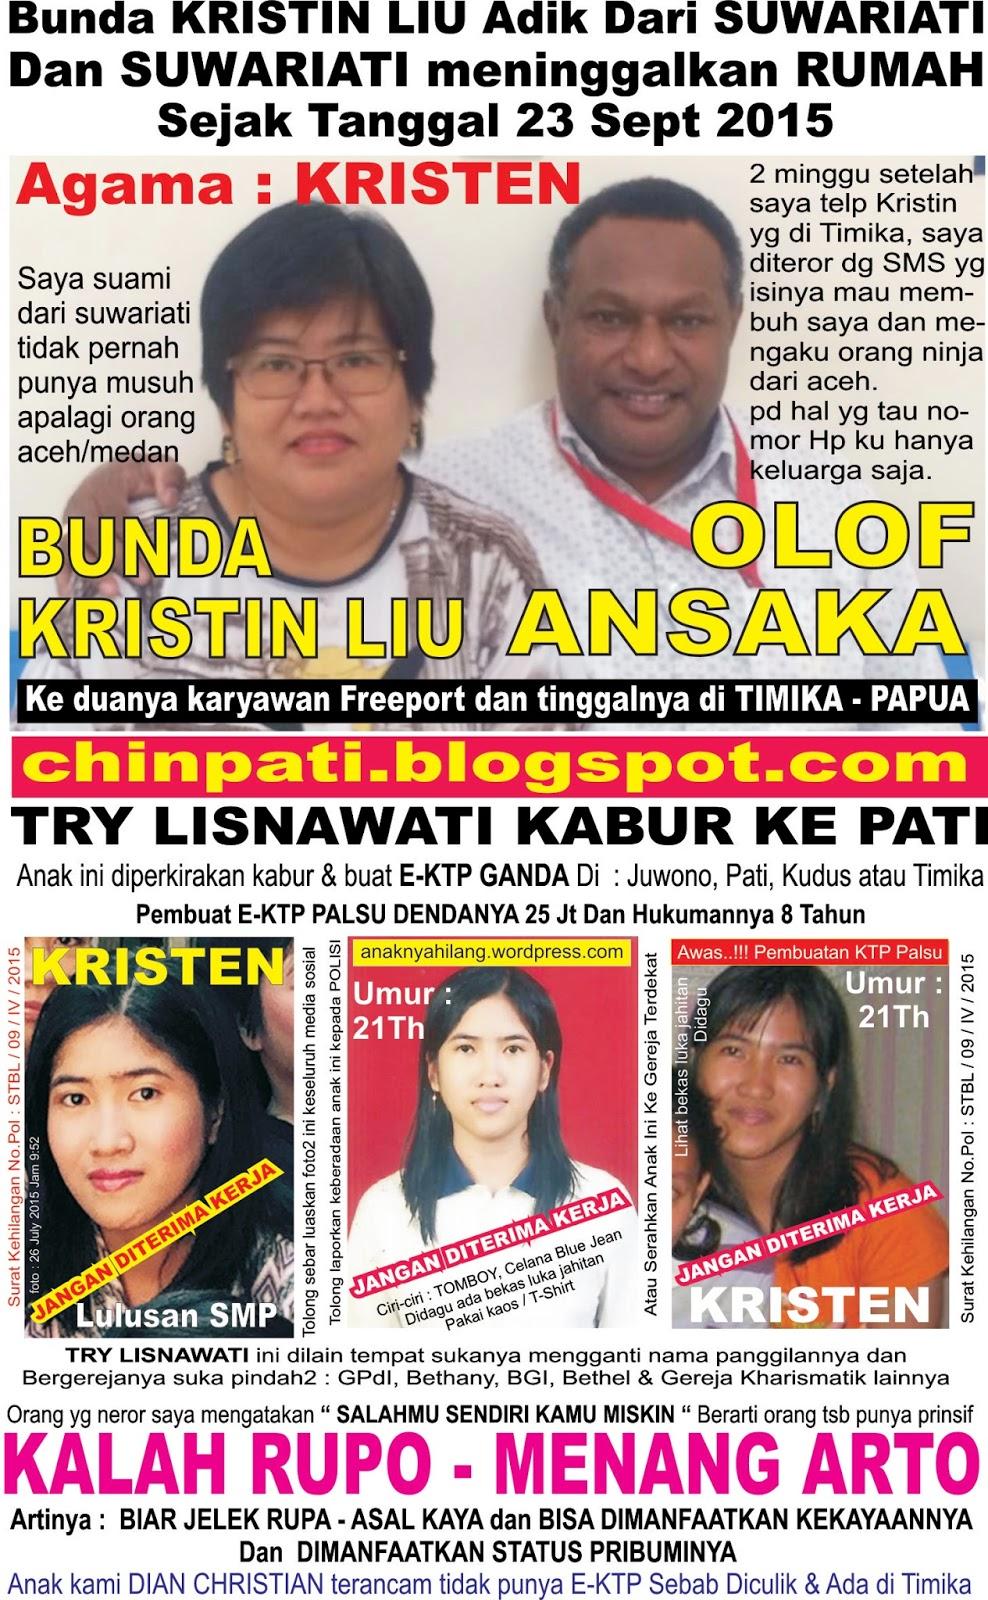 Toko Baja Ringan Bandar Lampung Gereja, Lagu Rohani, Pendeta, Buku, Ret ...